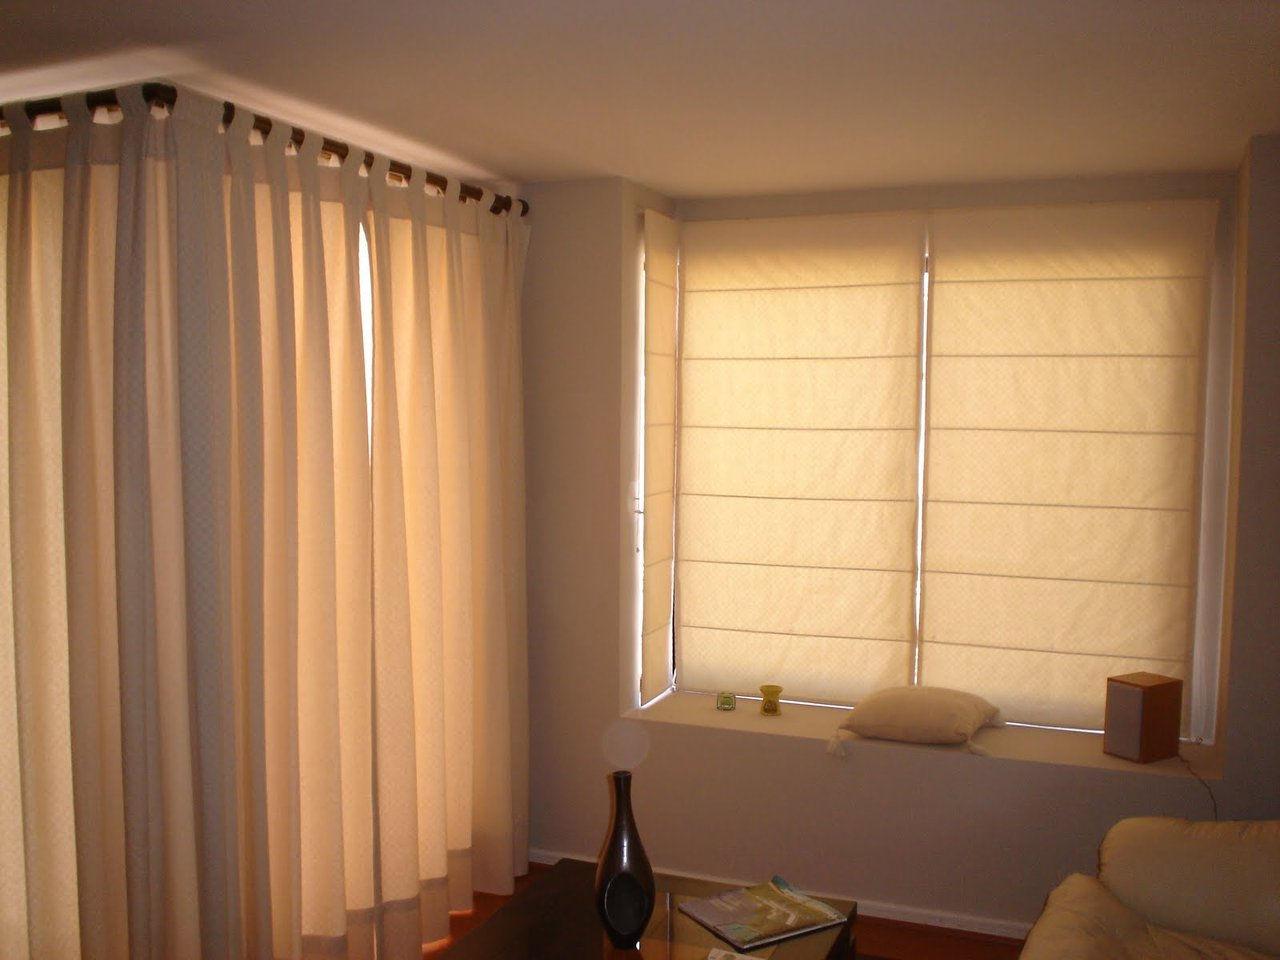 Mundo cortinas - Tipos de cortinas ...